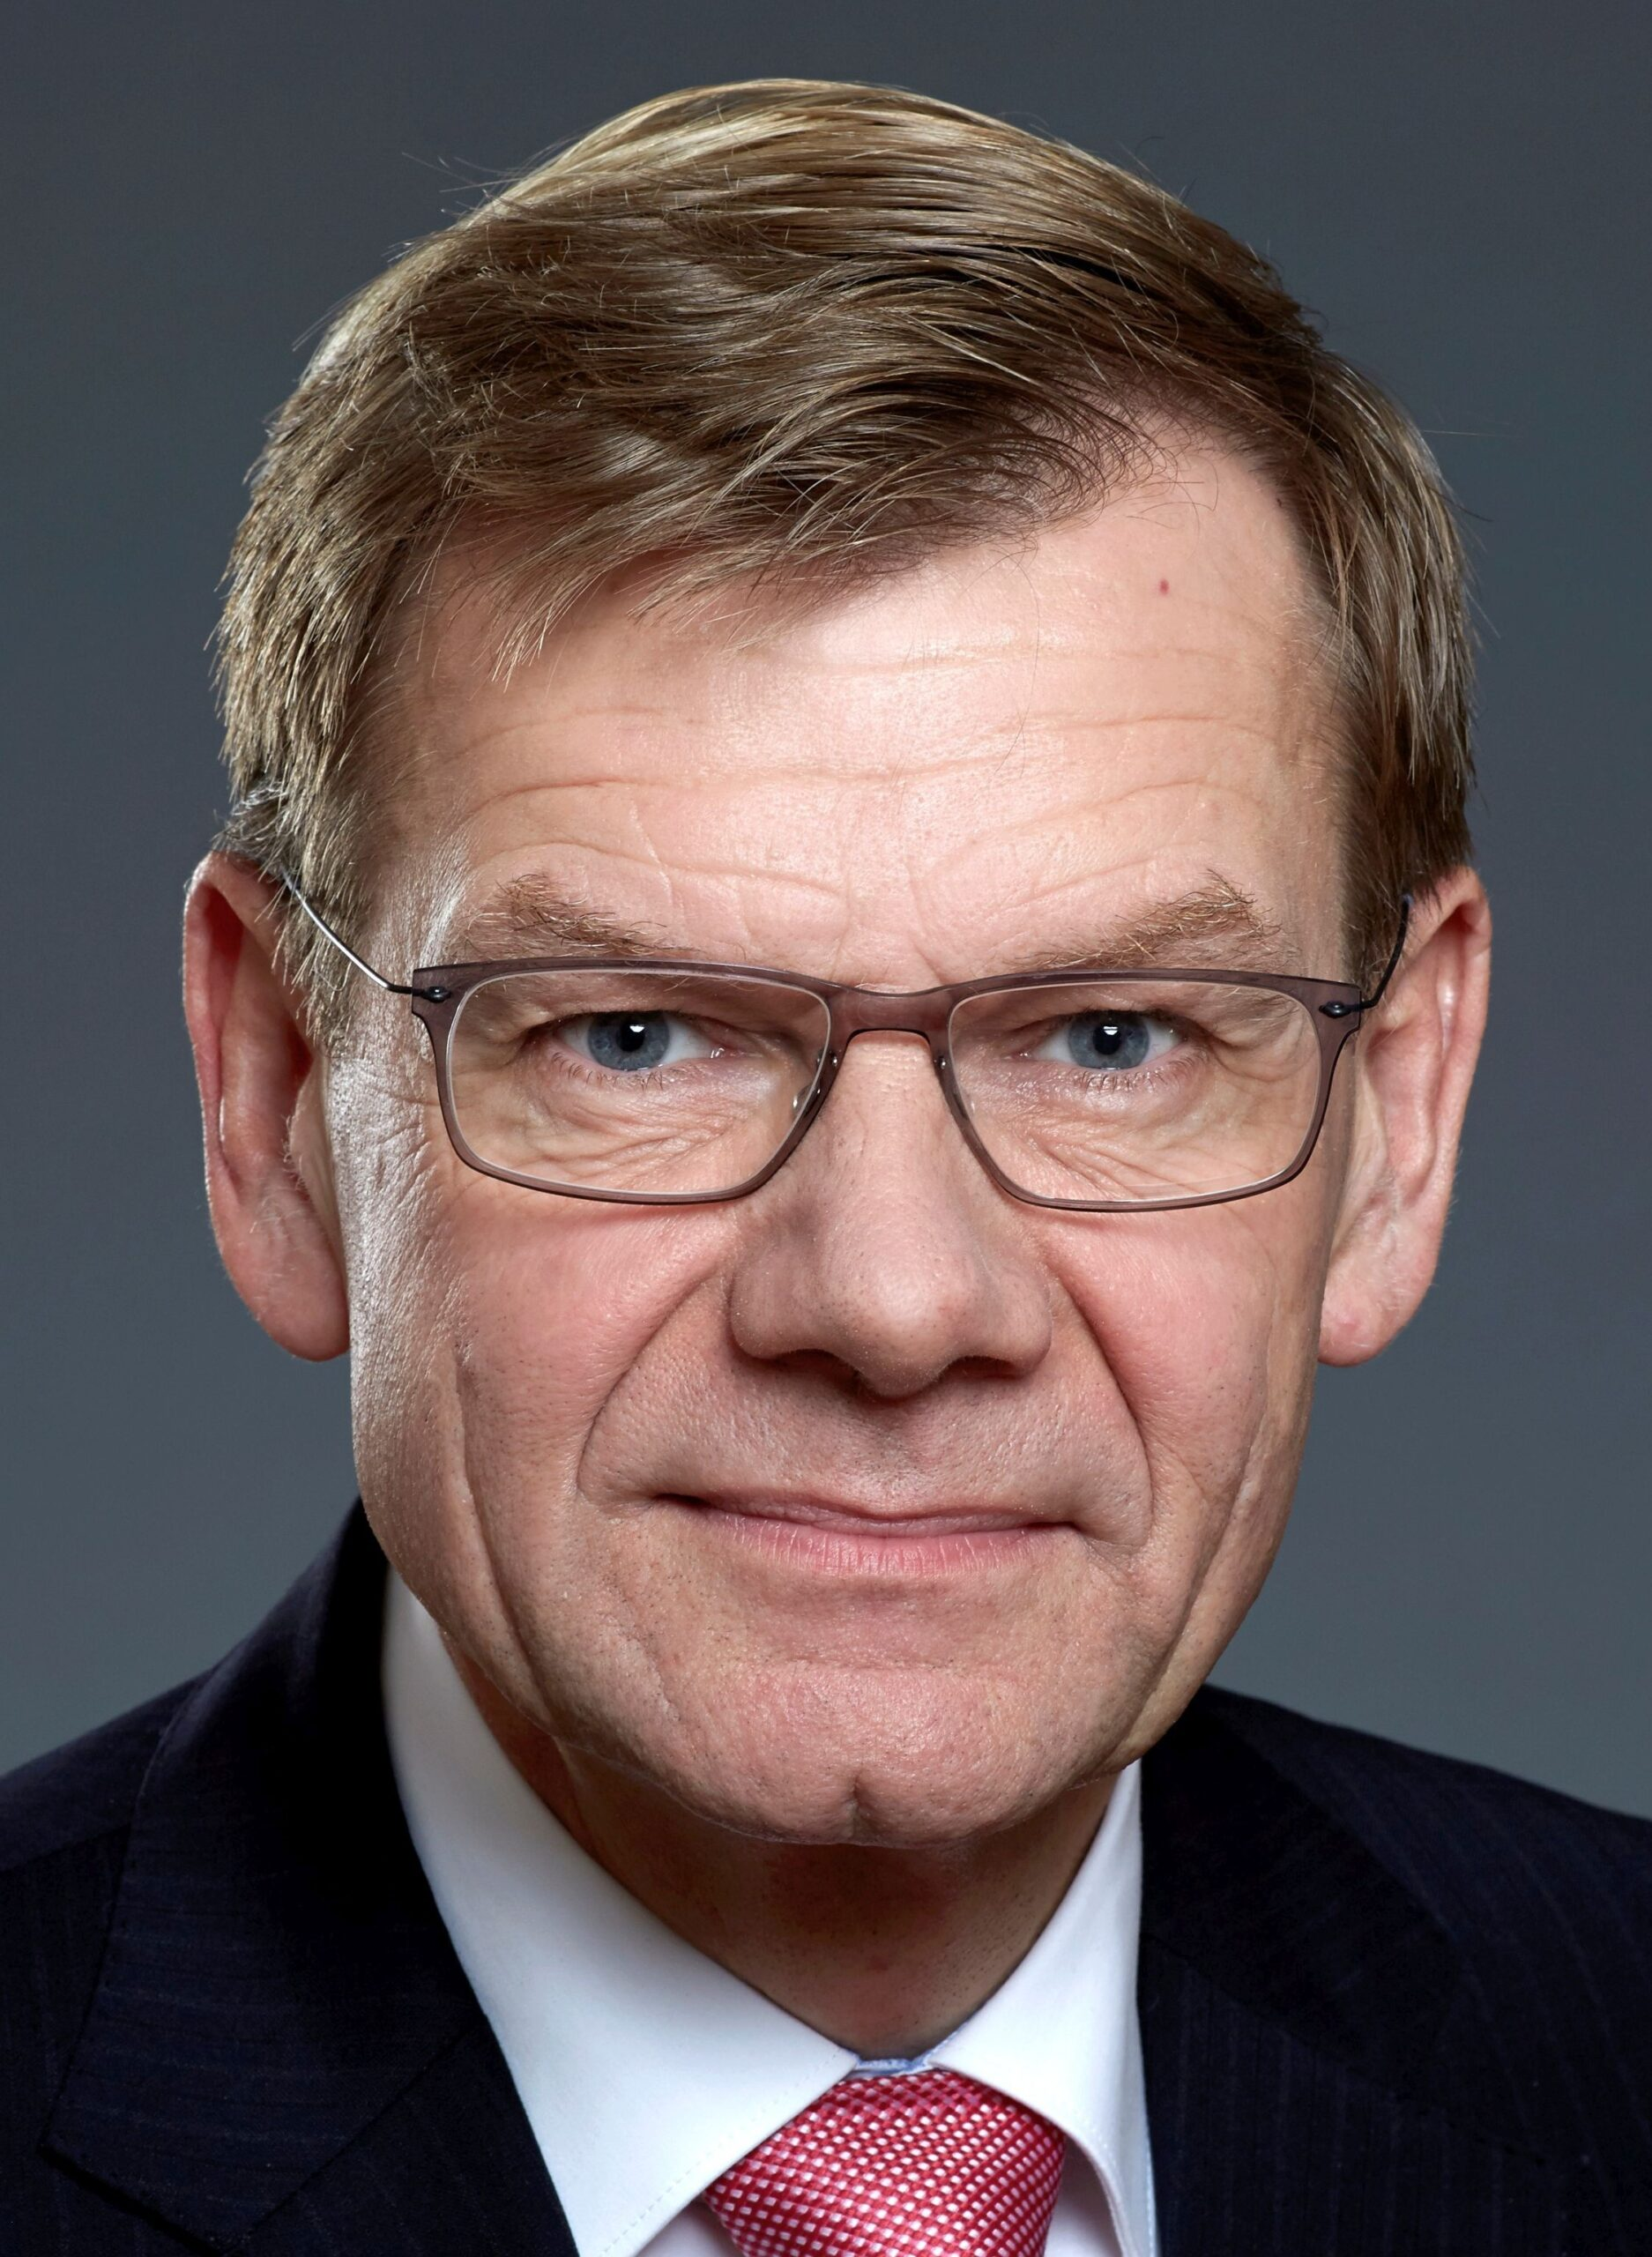 Johann David Wadephul